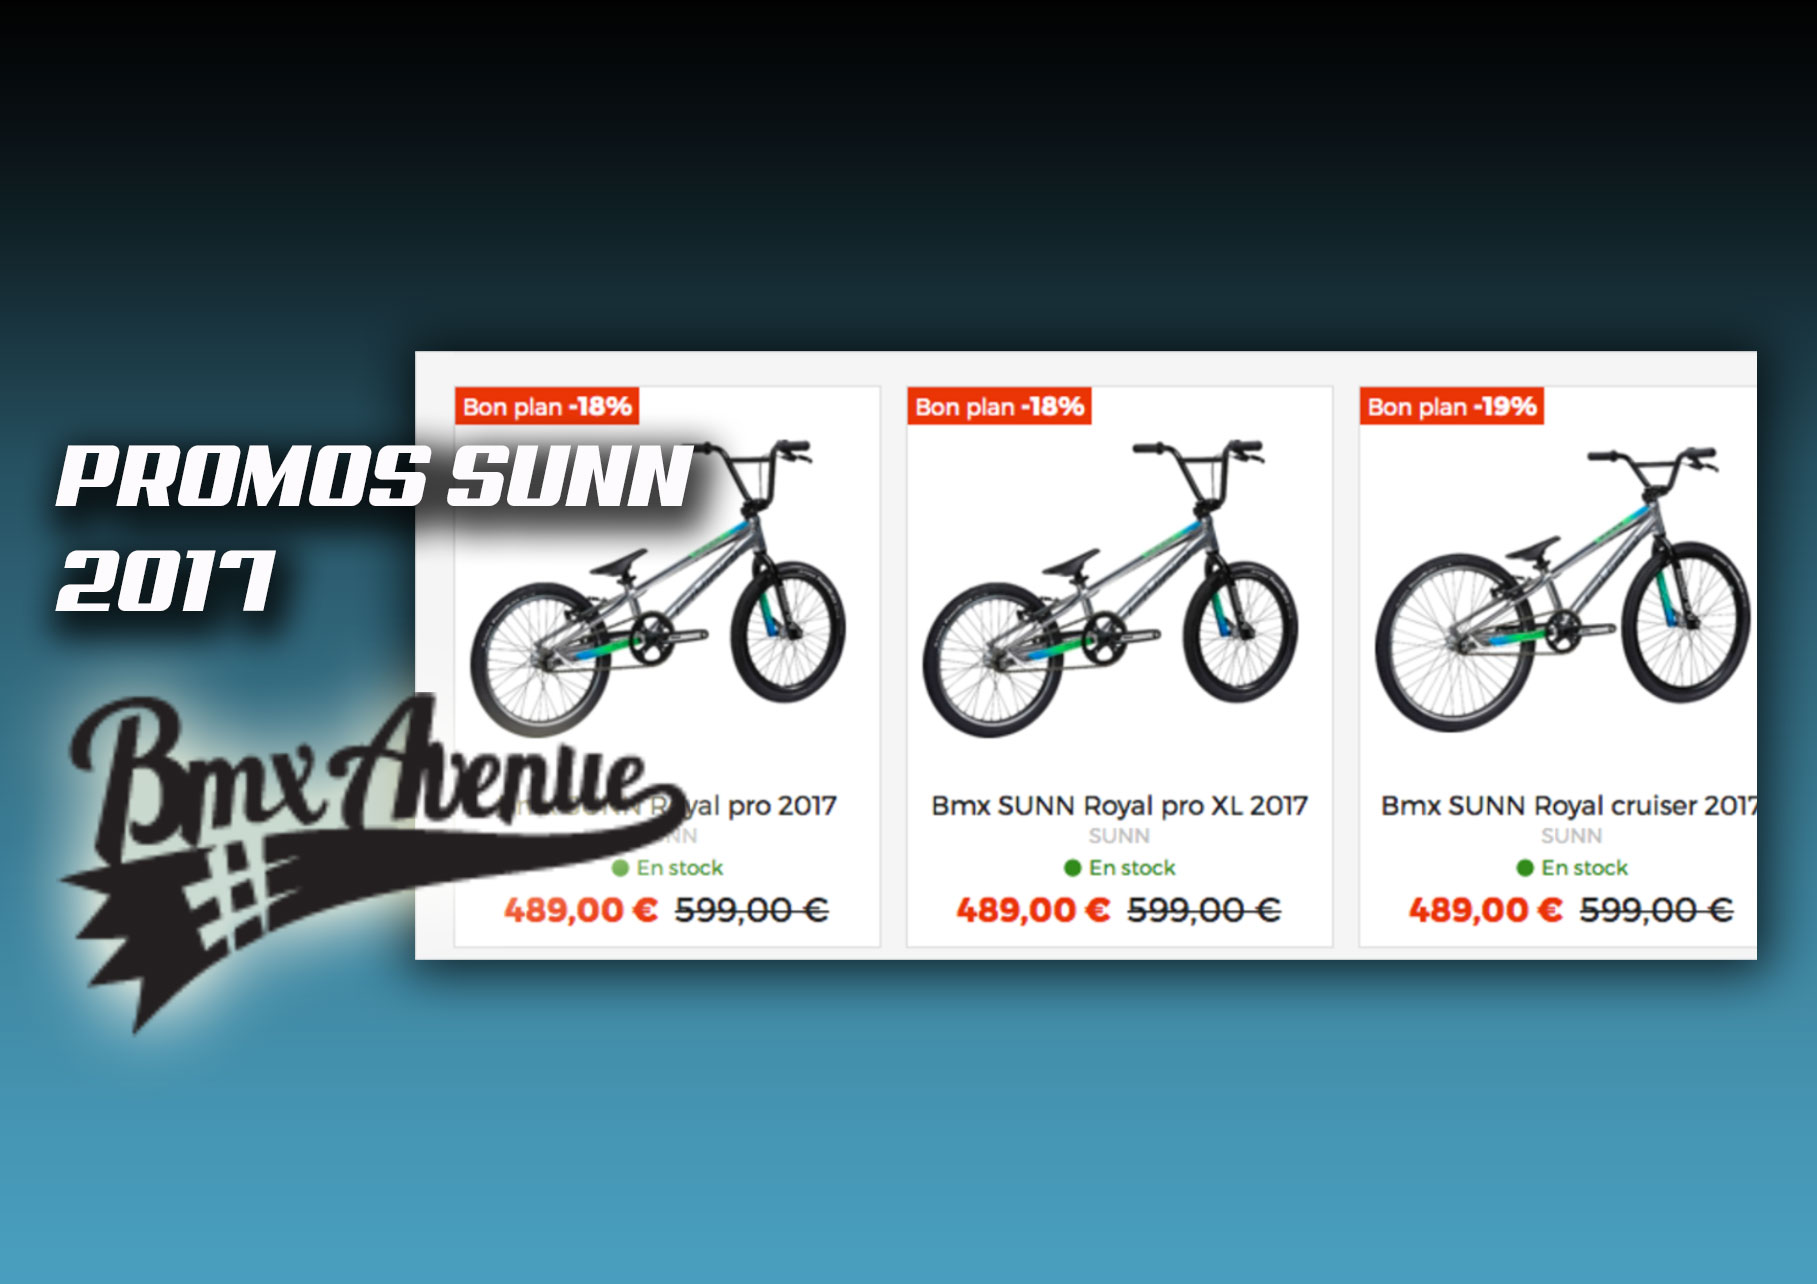 PROMOS SUNN 2017 chez BMX AVENUE